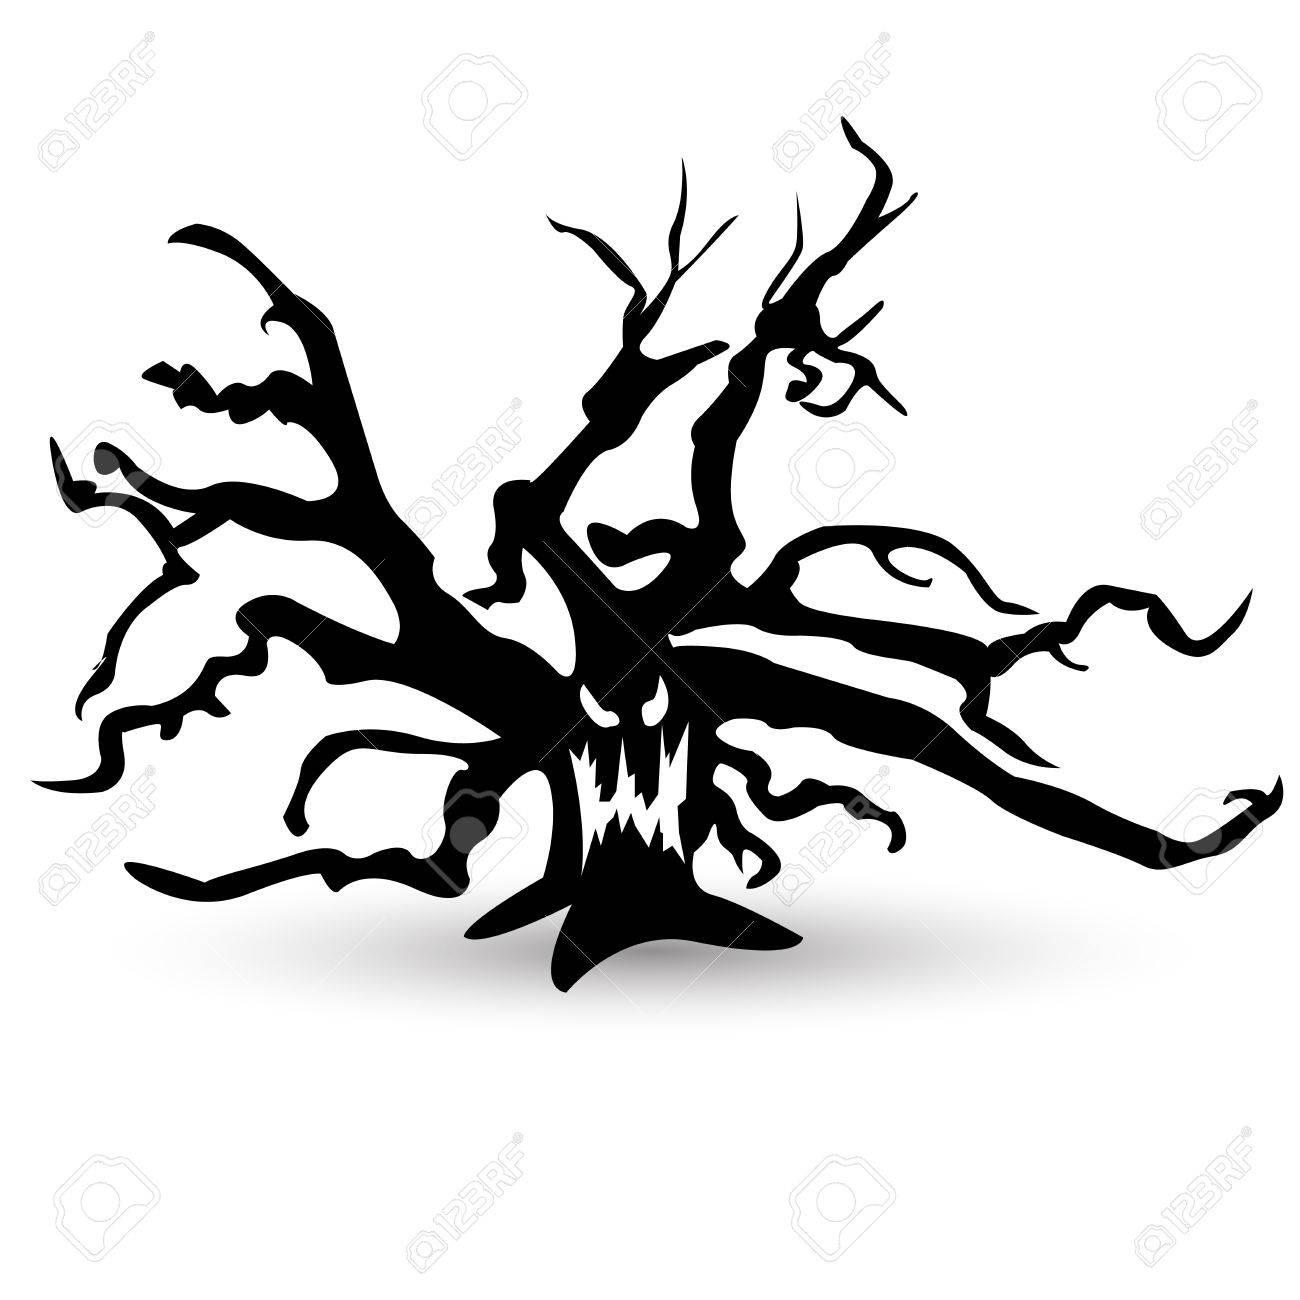 1300x1300 Halloween Vector Scary Tree. Black Illustration Royalty Free